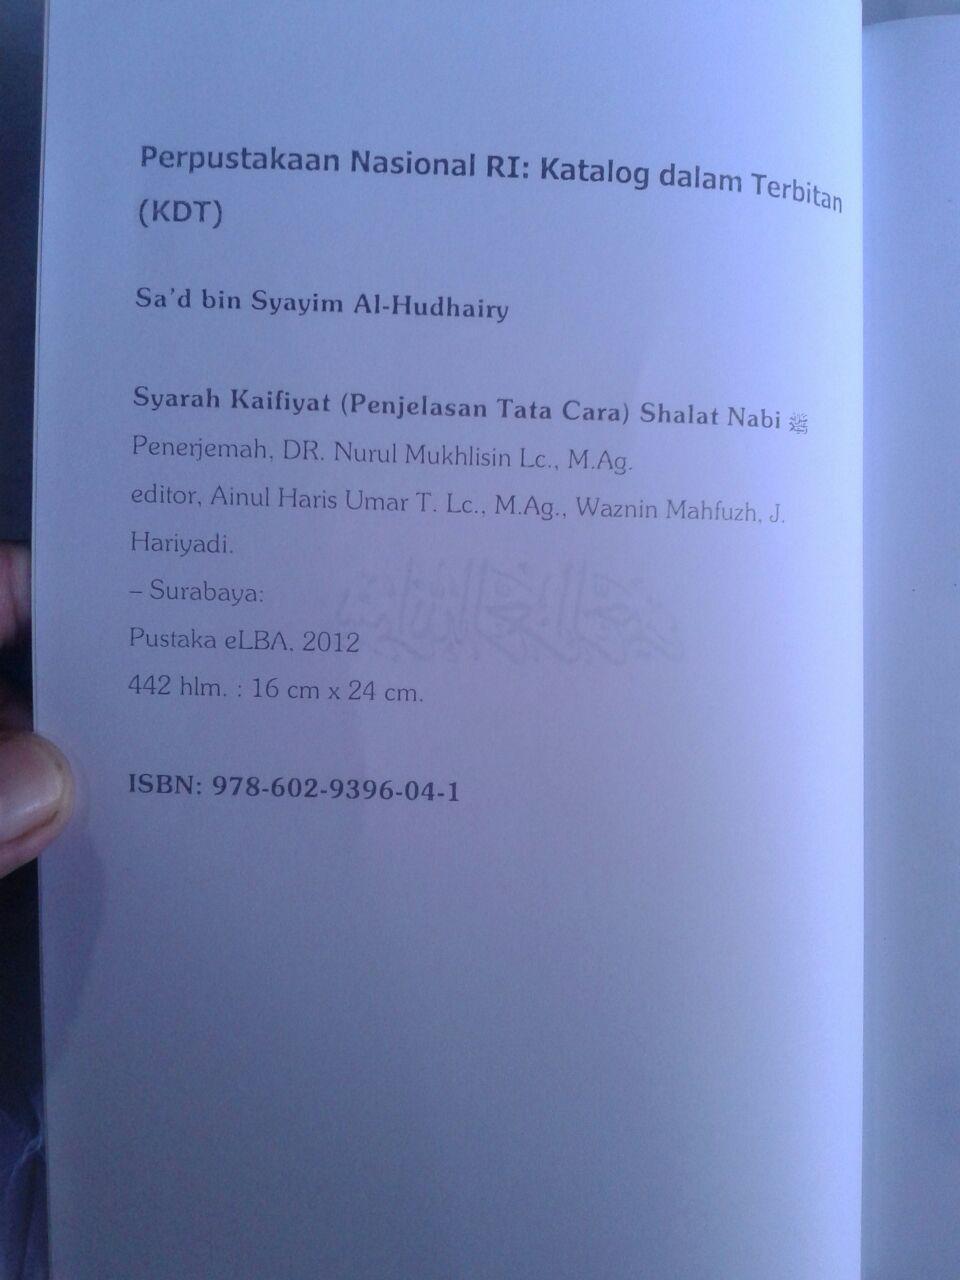 Buku Syarah Kaifiyat Penjelasan Tata Cara Shalat Nabi Syaikh Bin Baz isi 2